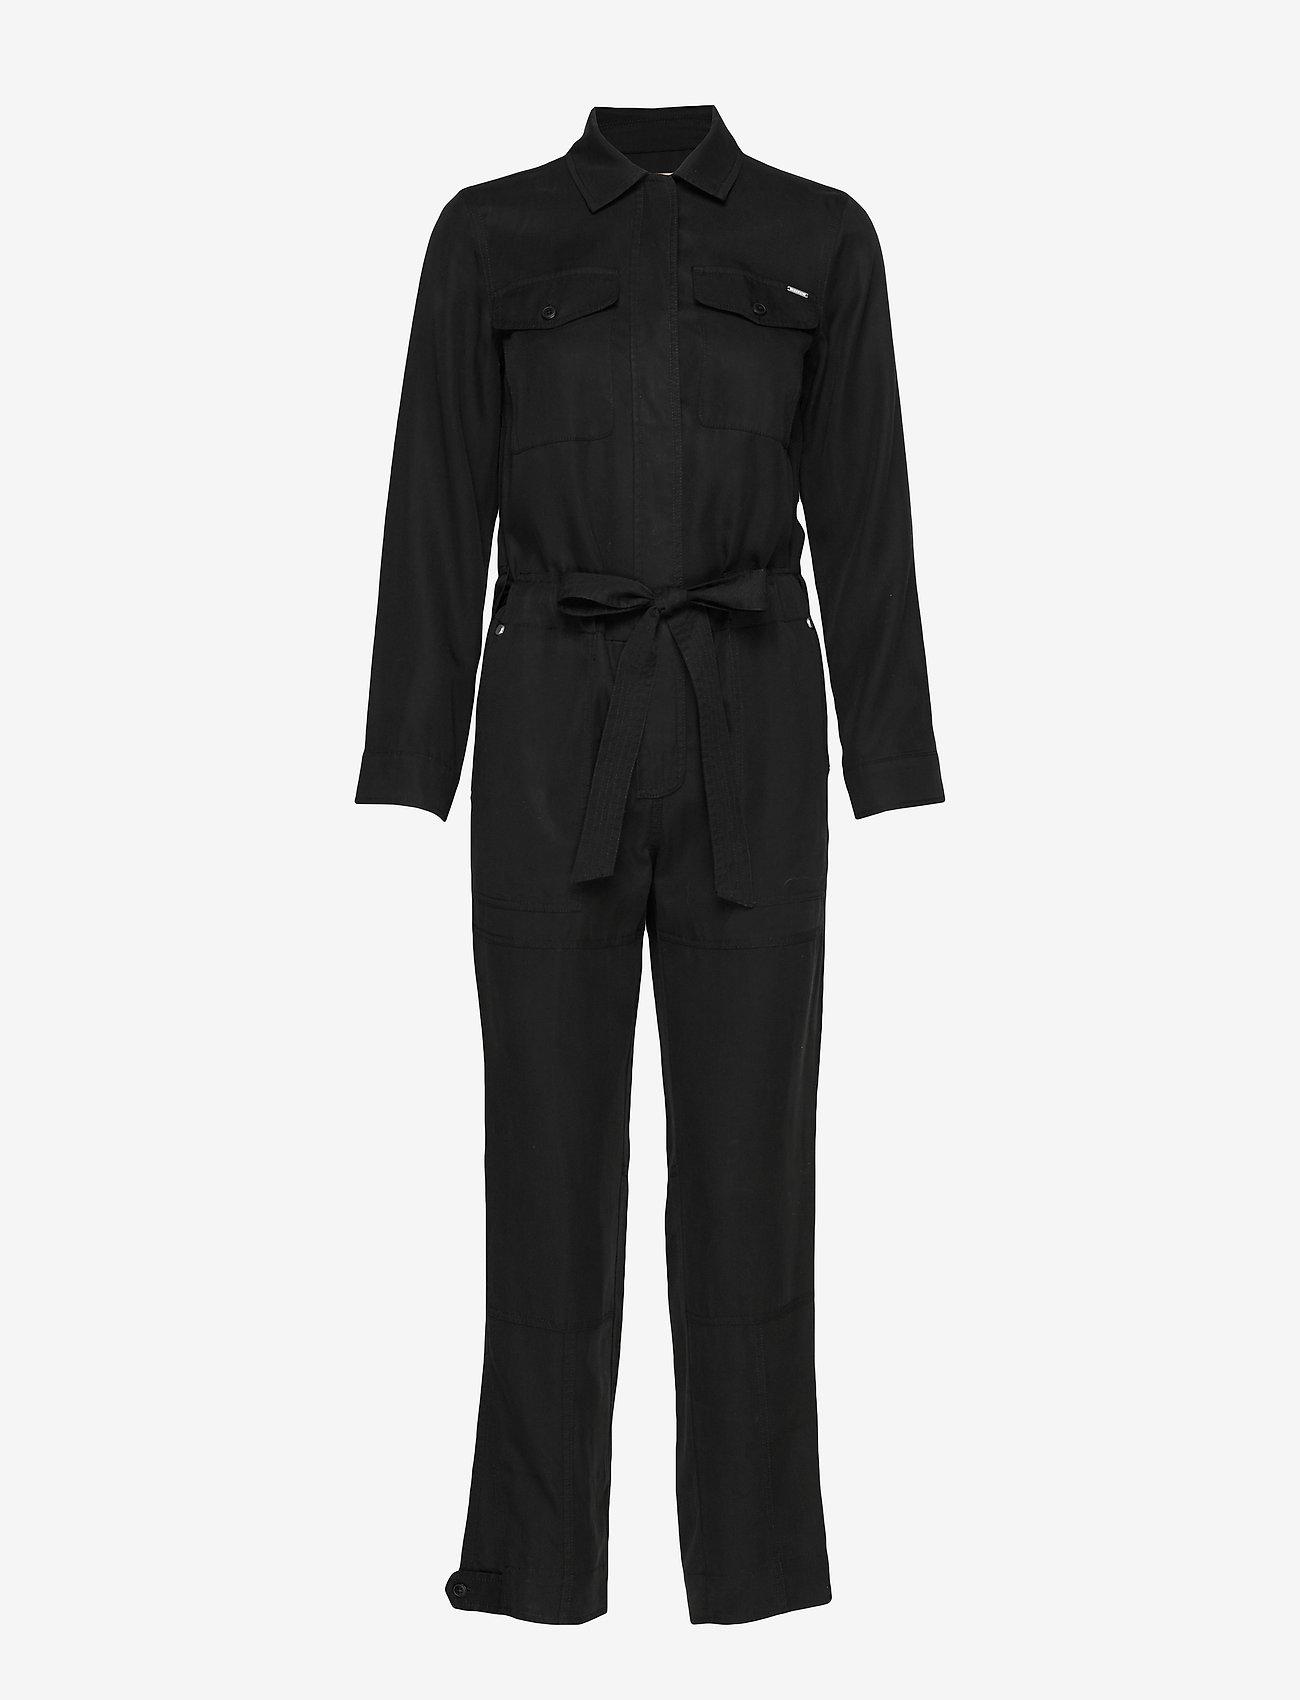 Superdry - DESERT MILITARY JUMPSUIT - jumpsuits - black - 0